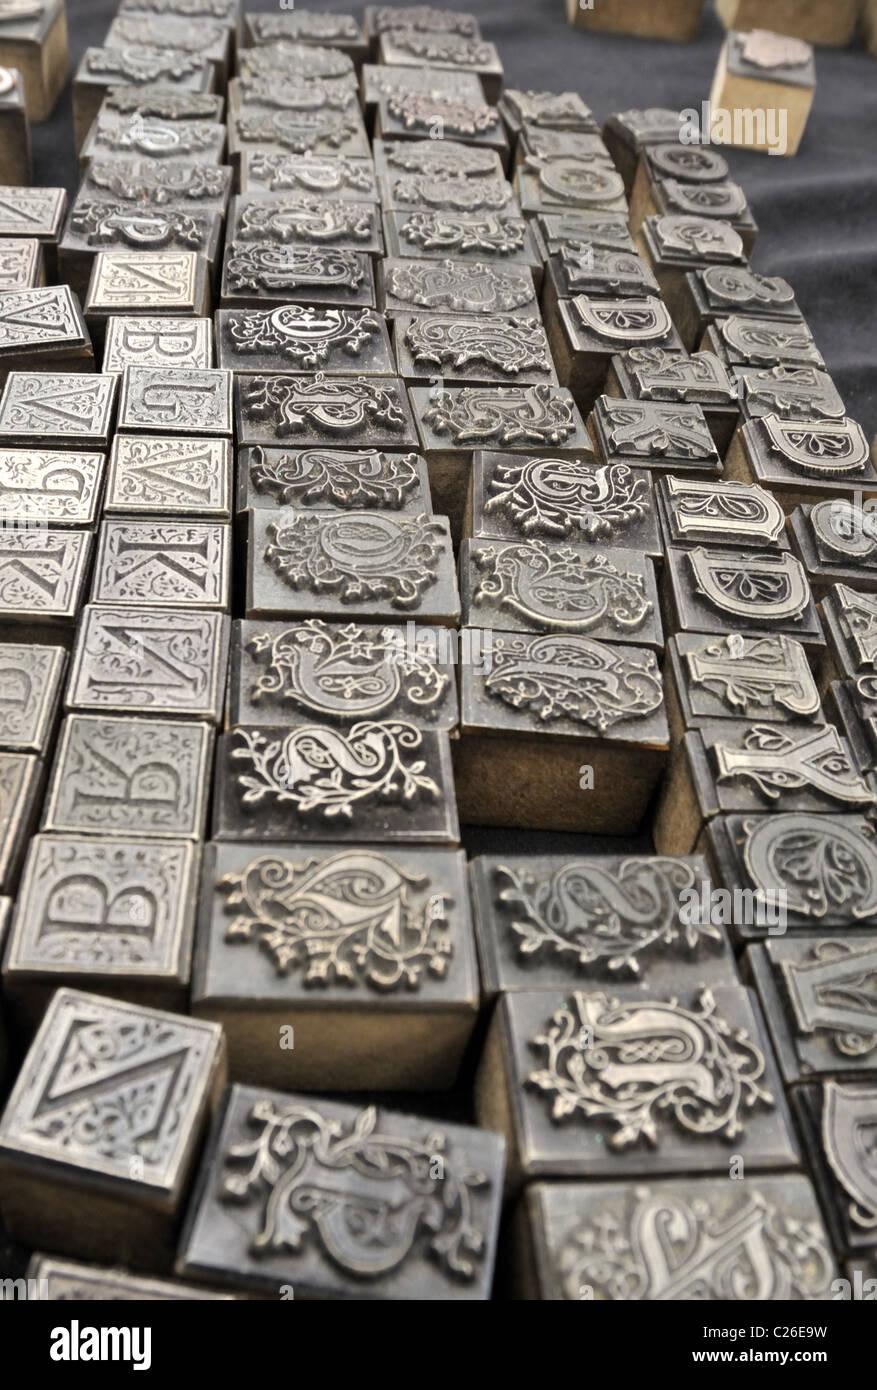 Metal typesetting sorts at Greenwich market, London, UK. - Stock Image